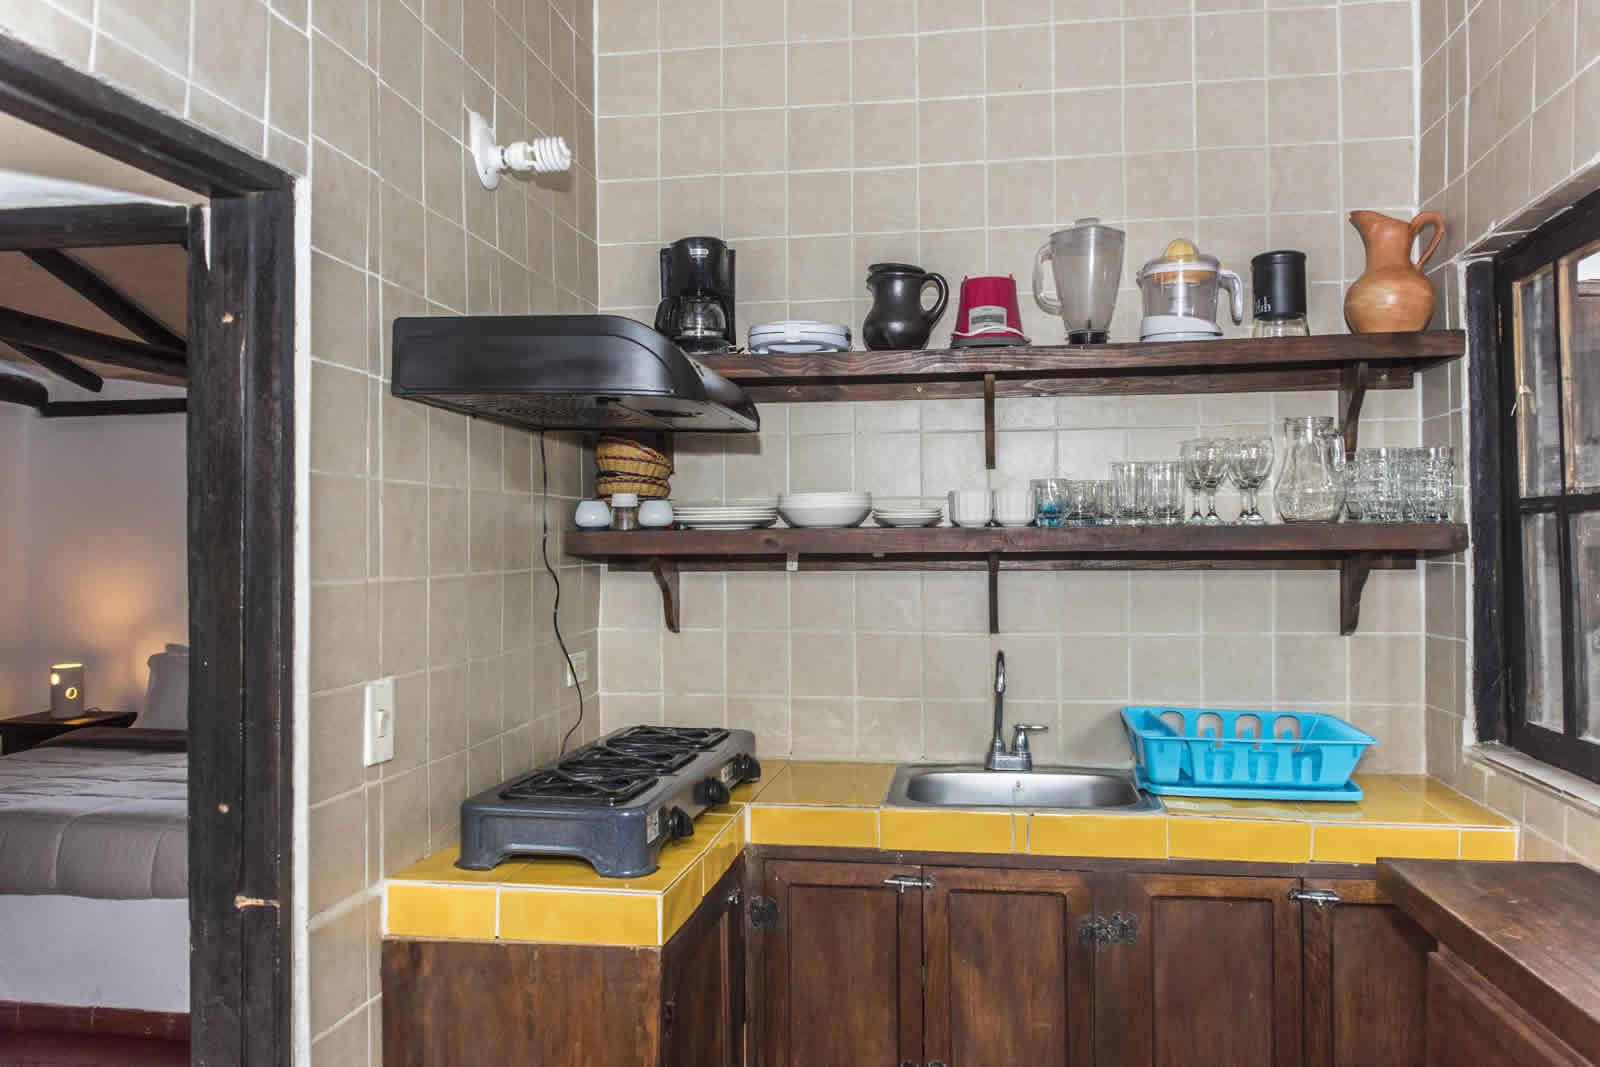 Alquiler casa de verano Villa de Leyva cocina